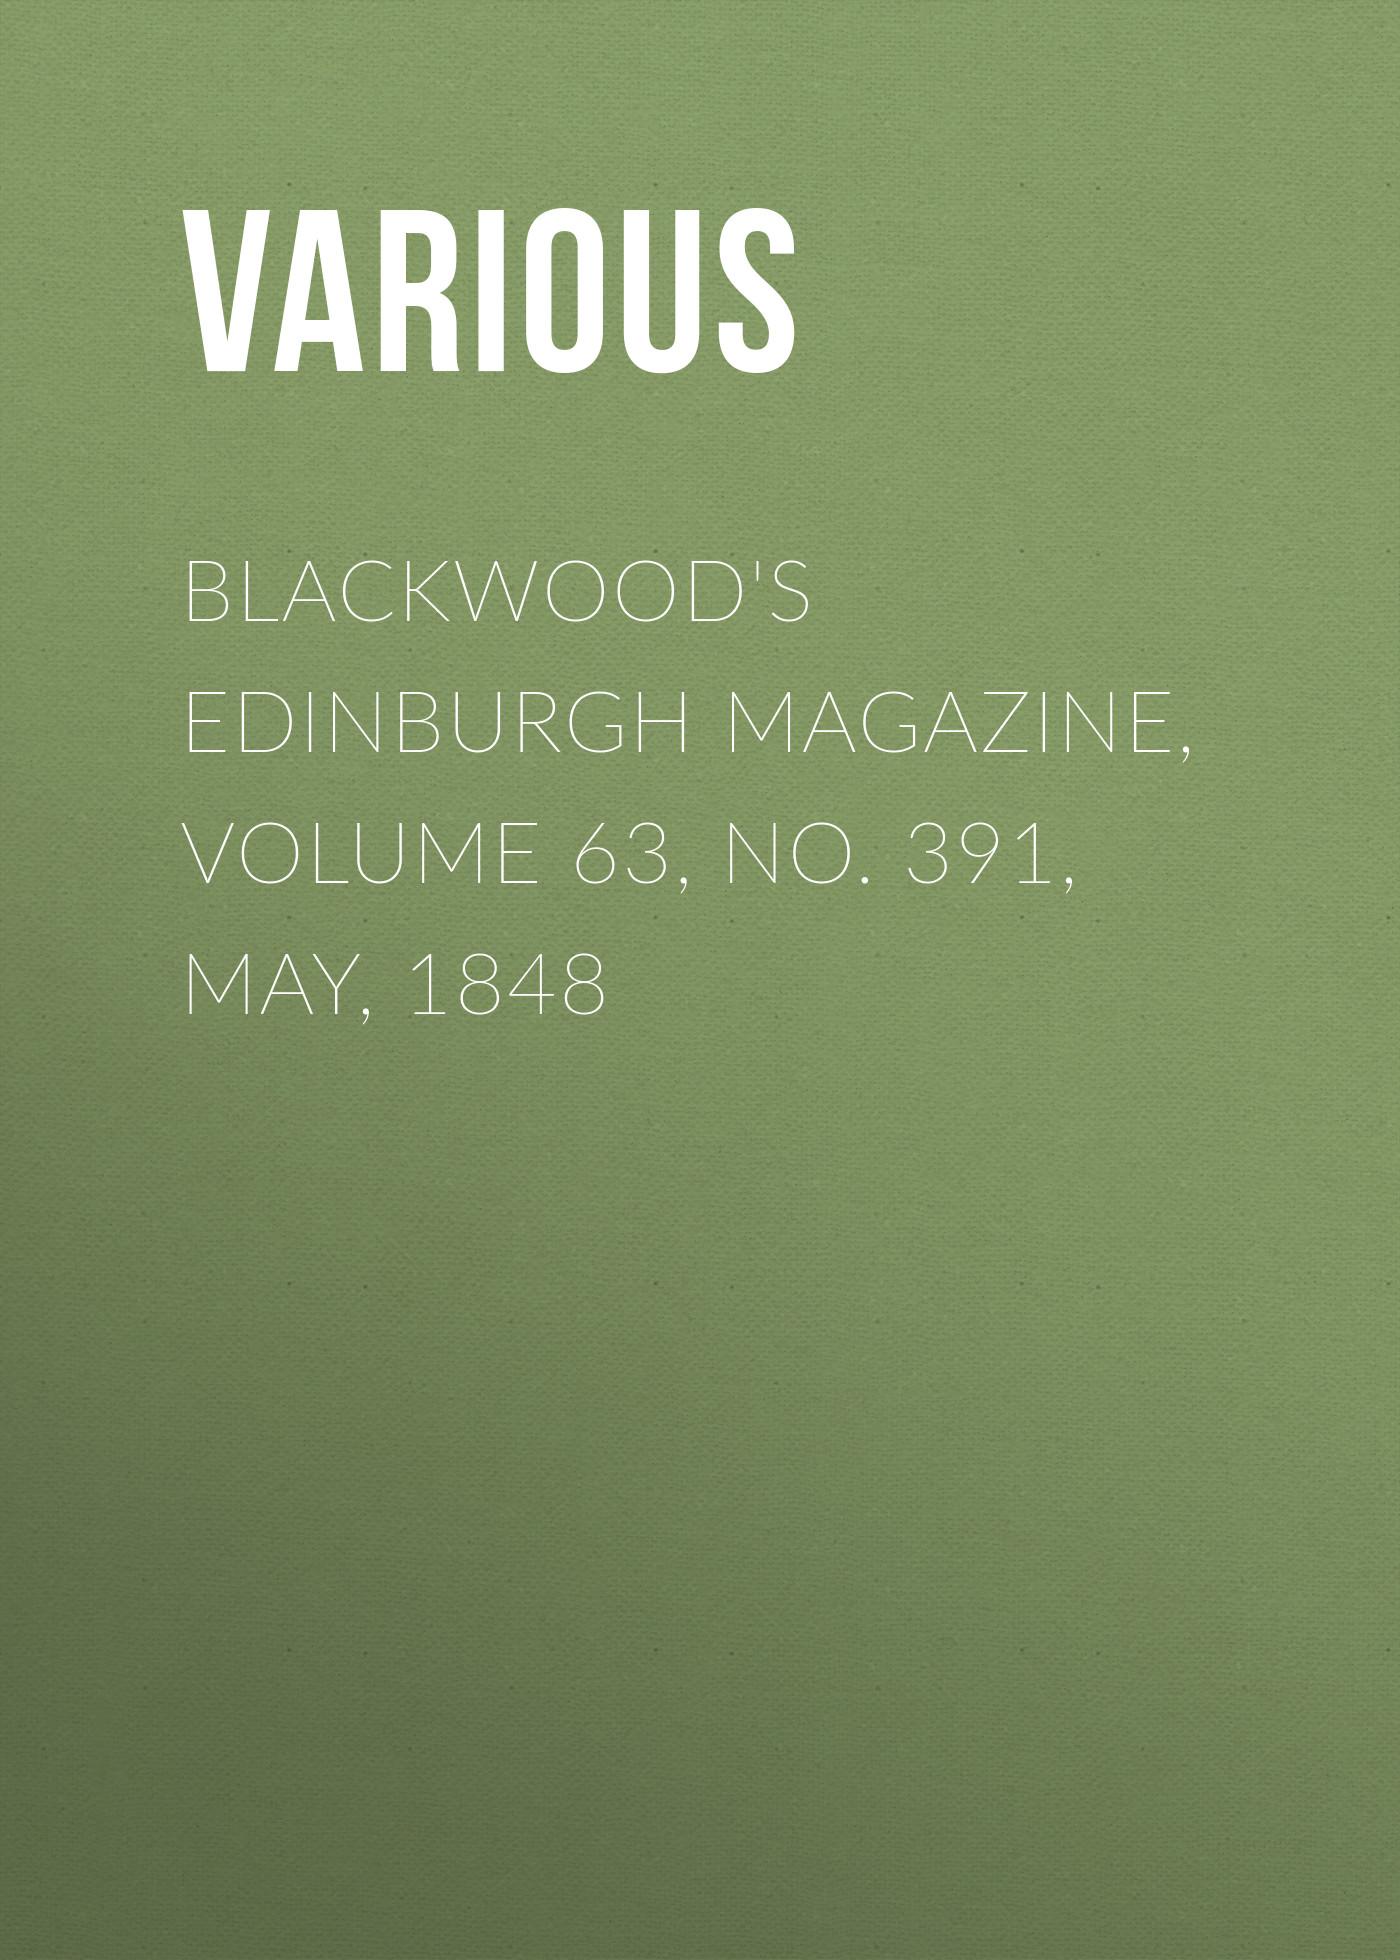 Various Blackwood's Edinburgh Magazine, Volume 63, No. 391, May, 1848